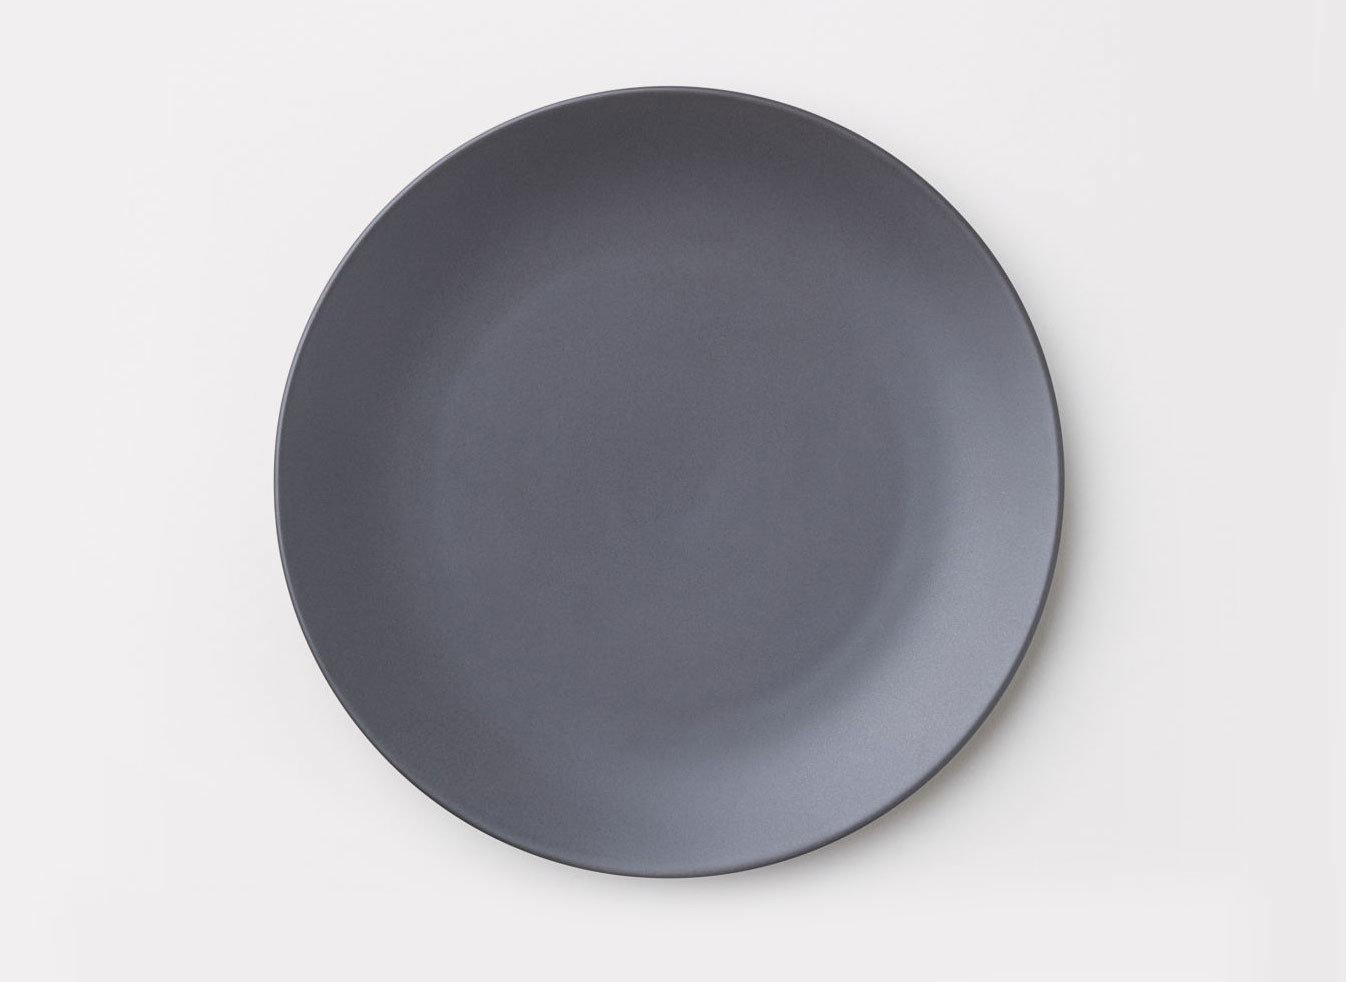 City Copenhagen Kyoto Marrakech Palm Springs Style + Design Travel Shop Tulum dishware indoor tableware plate product design dinnerware set product pan